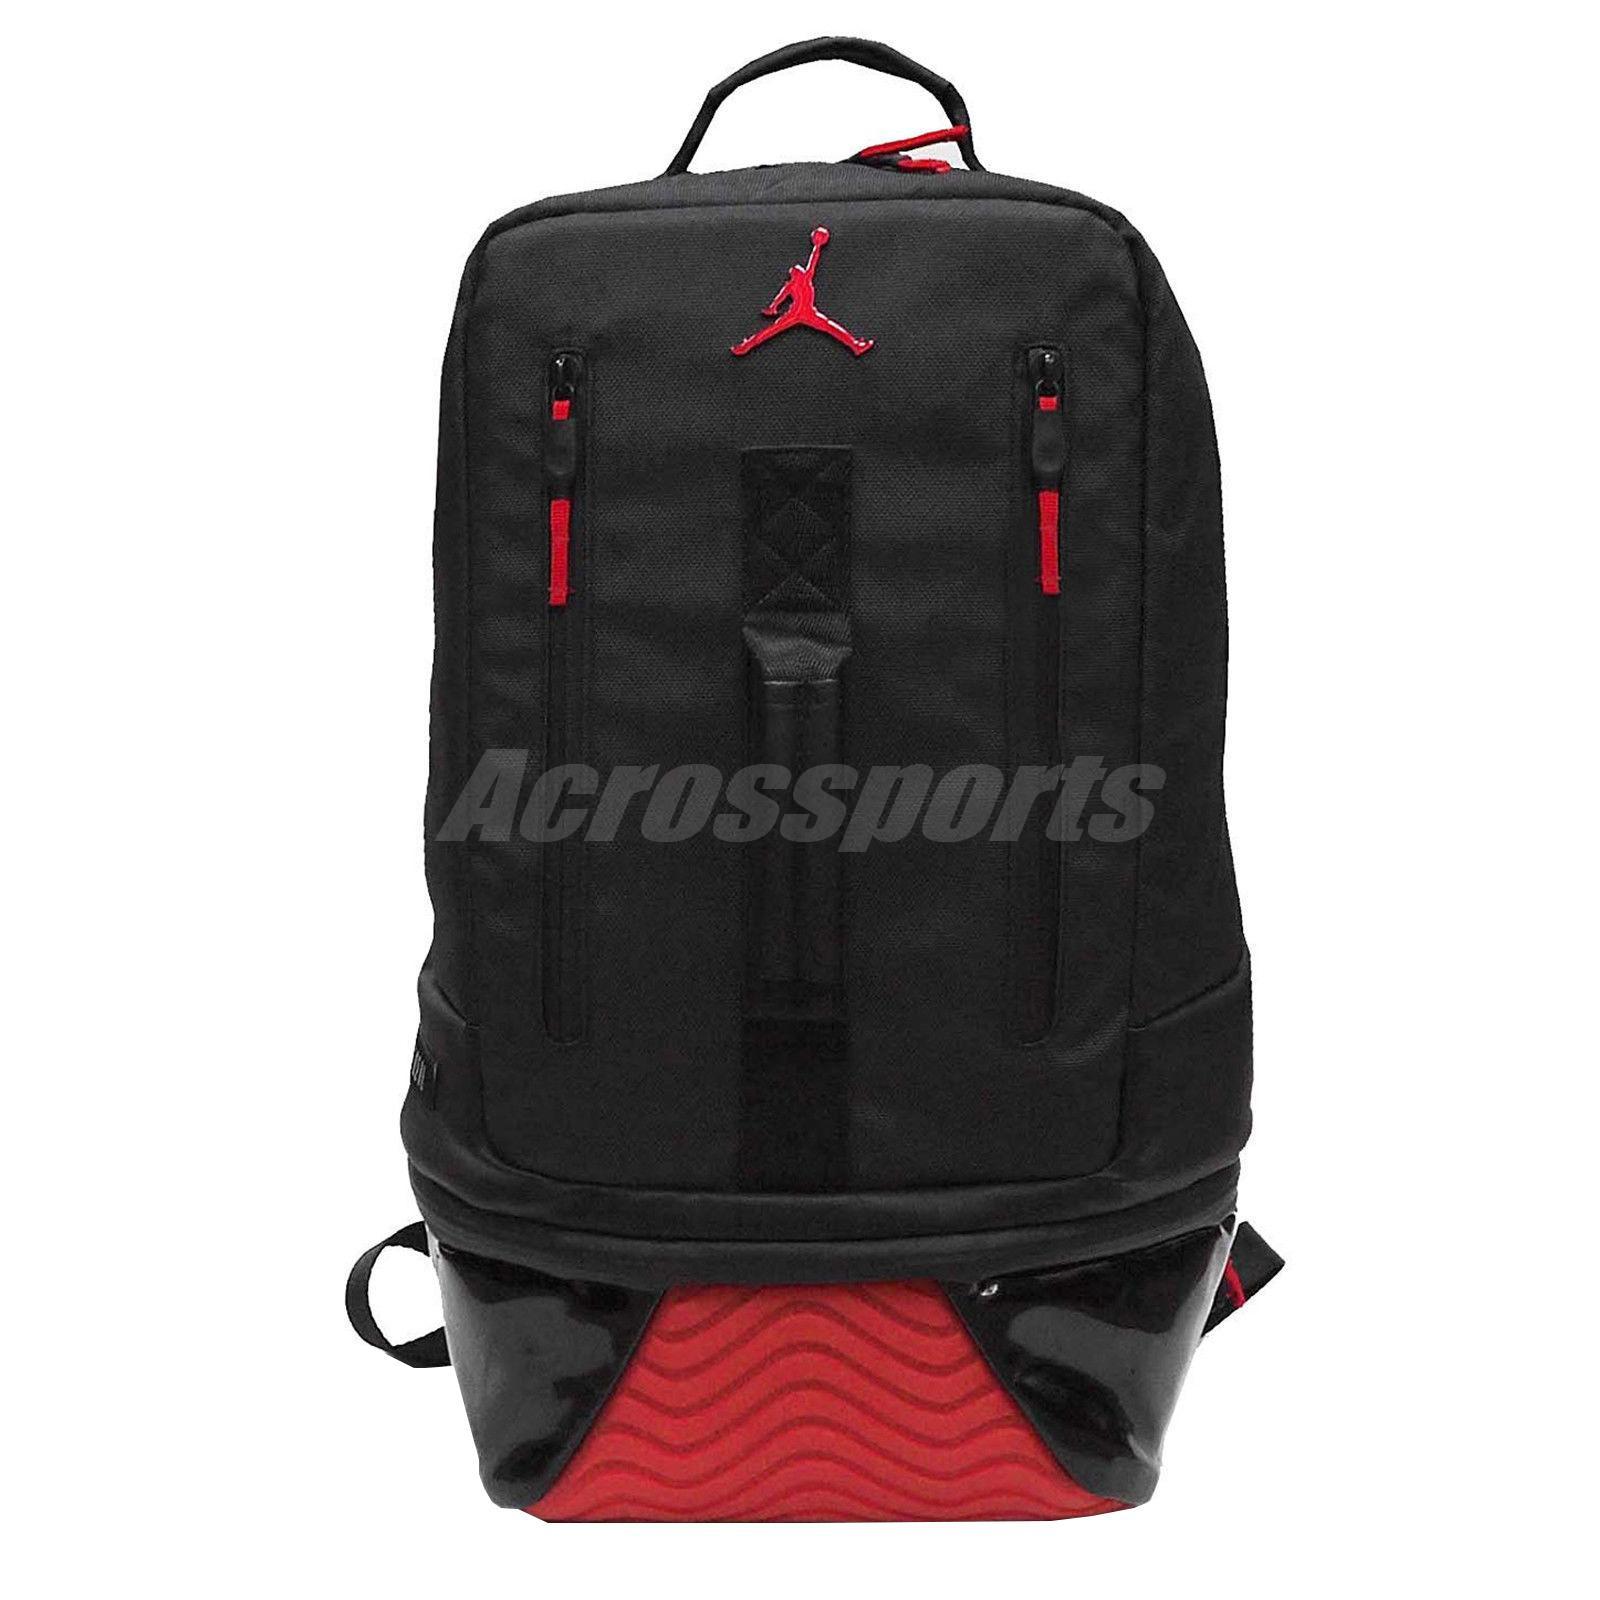 d1efbd530f8b85 Details about Nike Air Jordan Retro 11 XI Pack Bred Black Red Basketball  Gym Backpack Bookbag